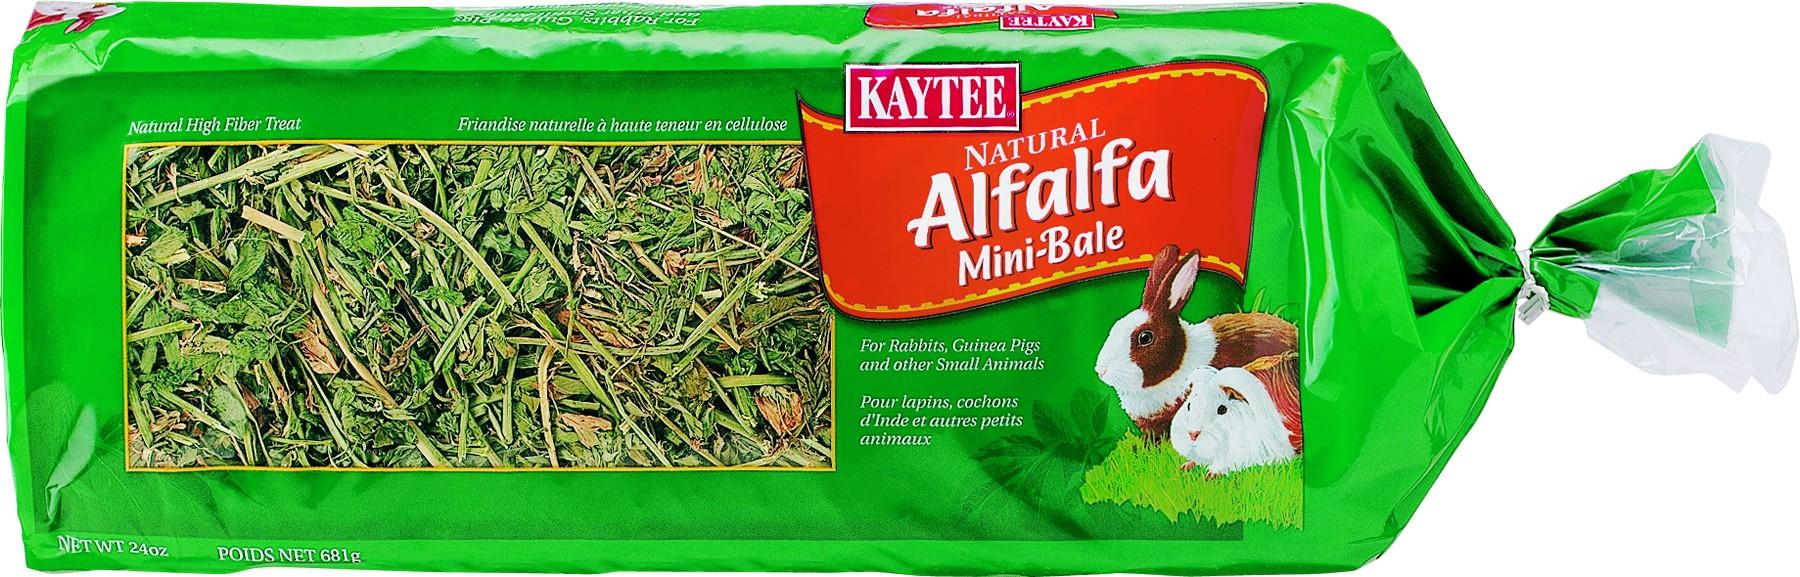 Alfalfa Minibale 24 Ounces